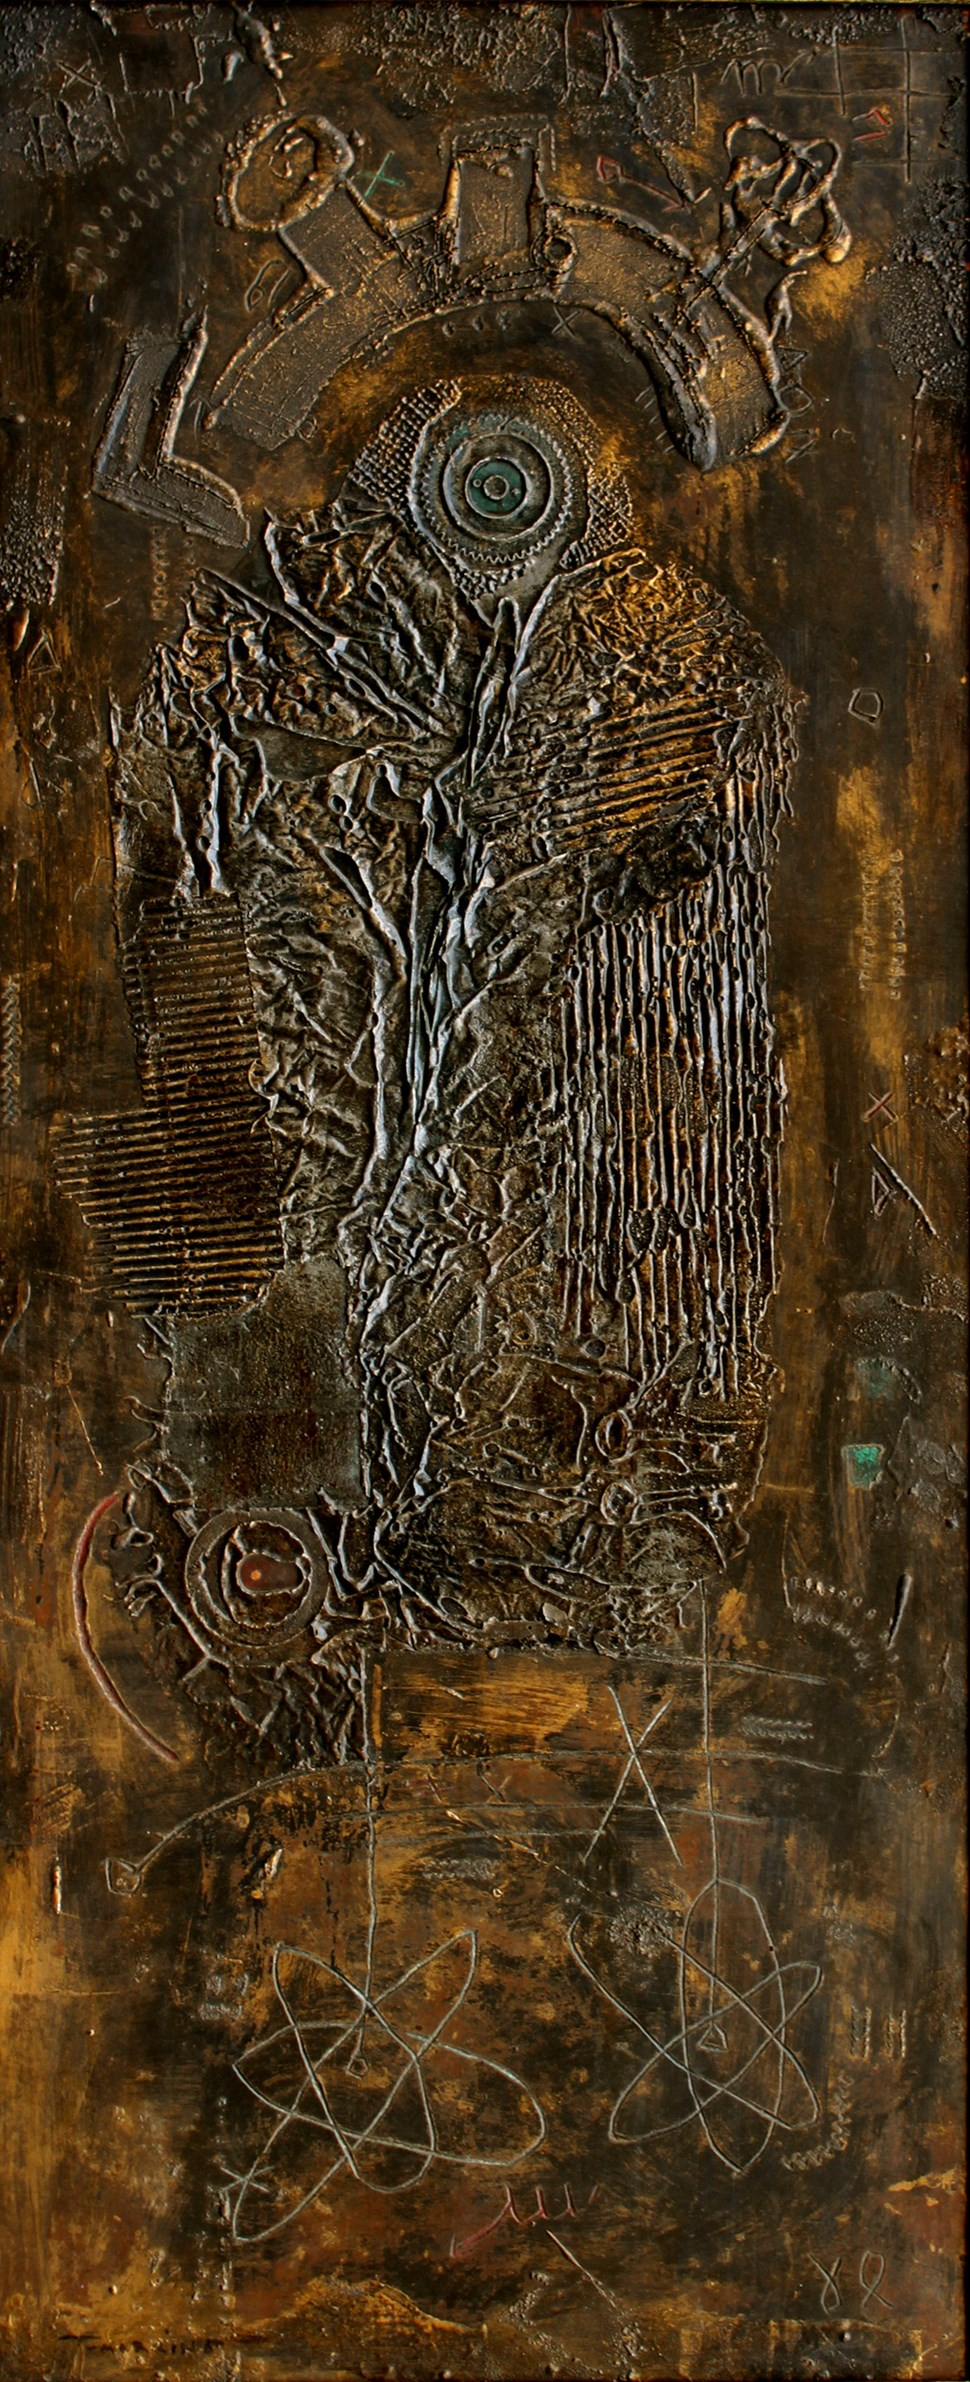 Untitled 65 - Igael Tumarkin (b. 1933 - )